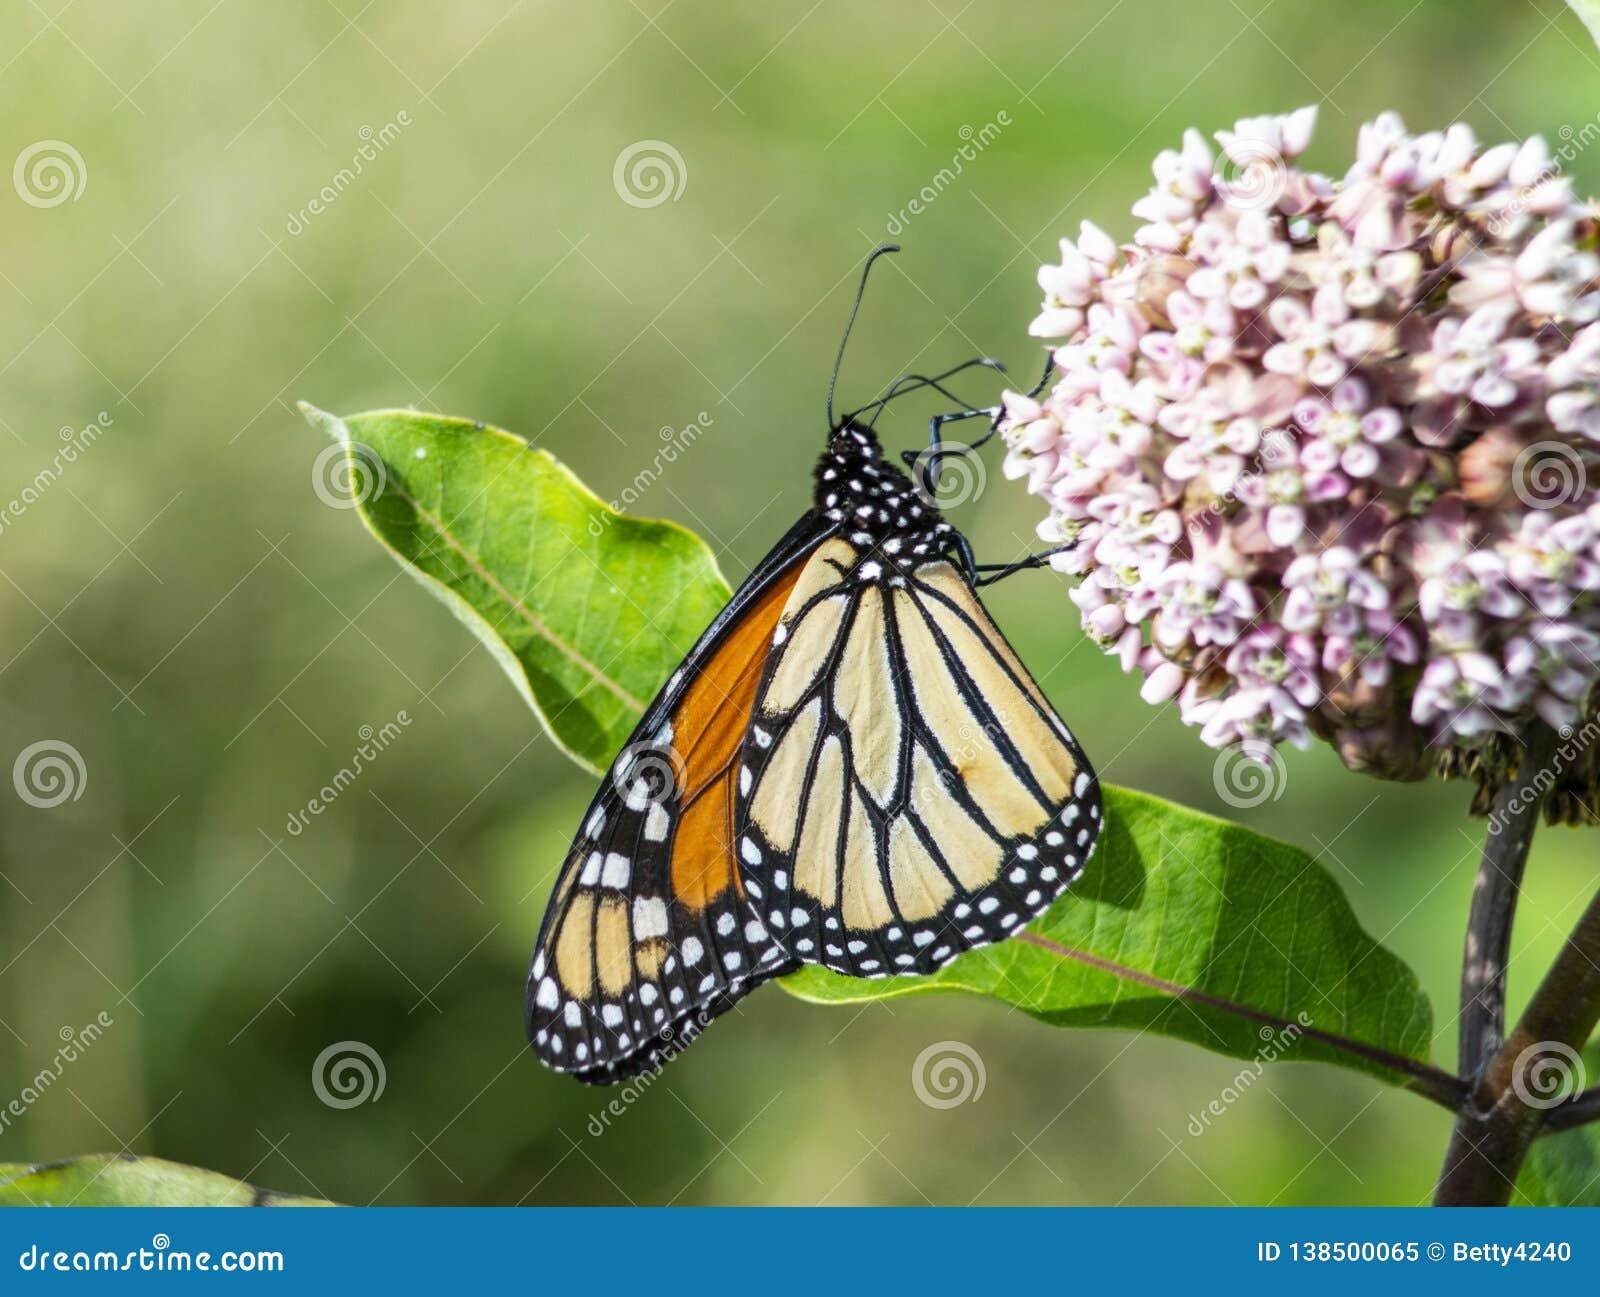 Monarch Butterfly feeding on Milkweed blooms.